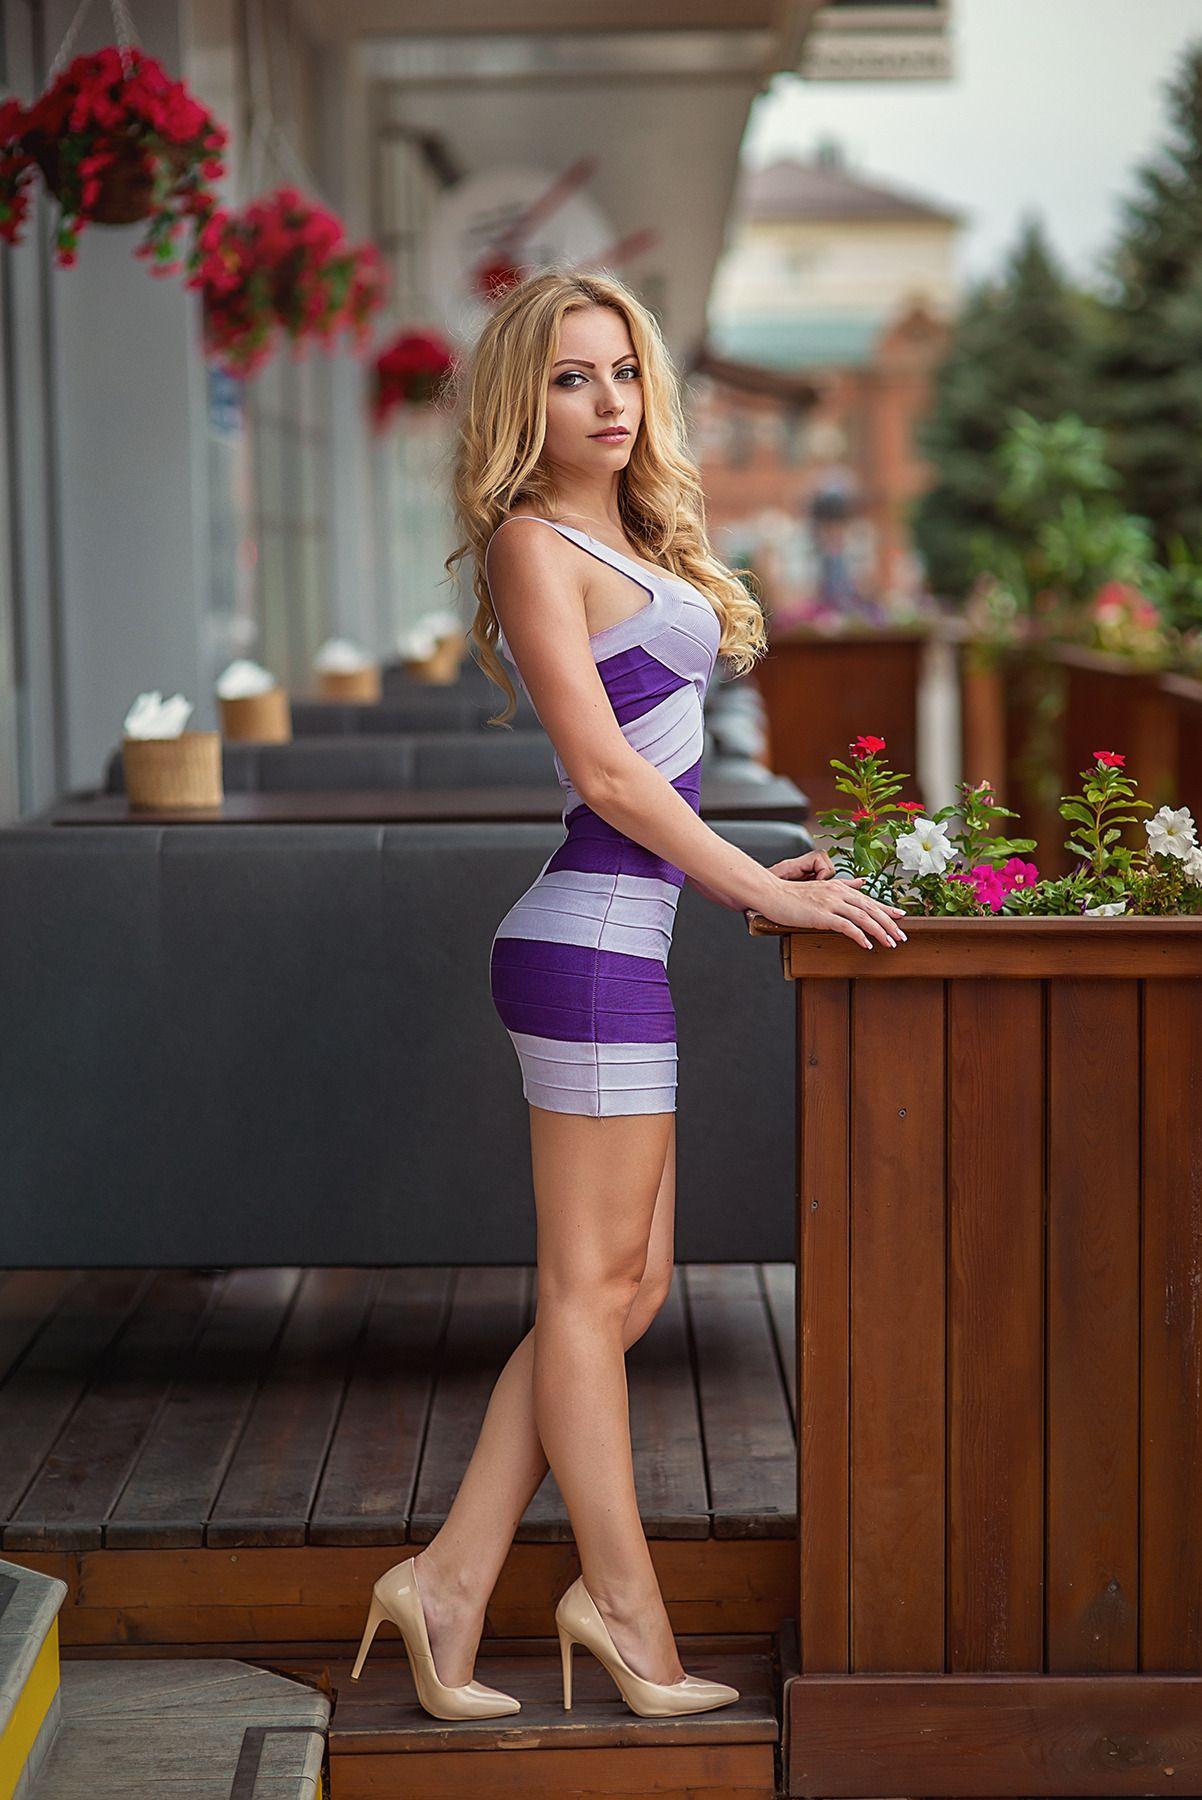 Sexy School Girls Short Skirts